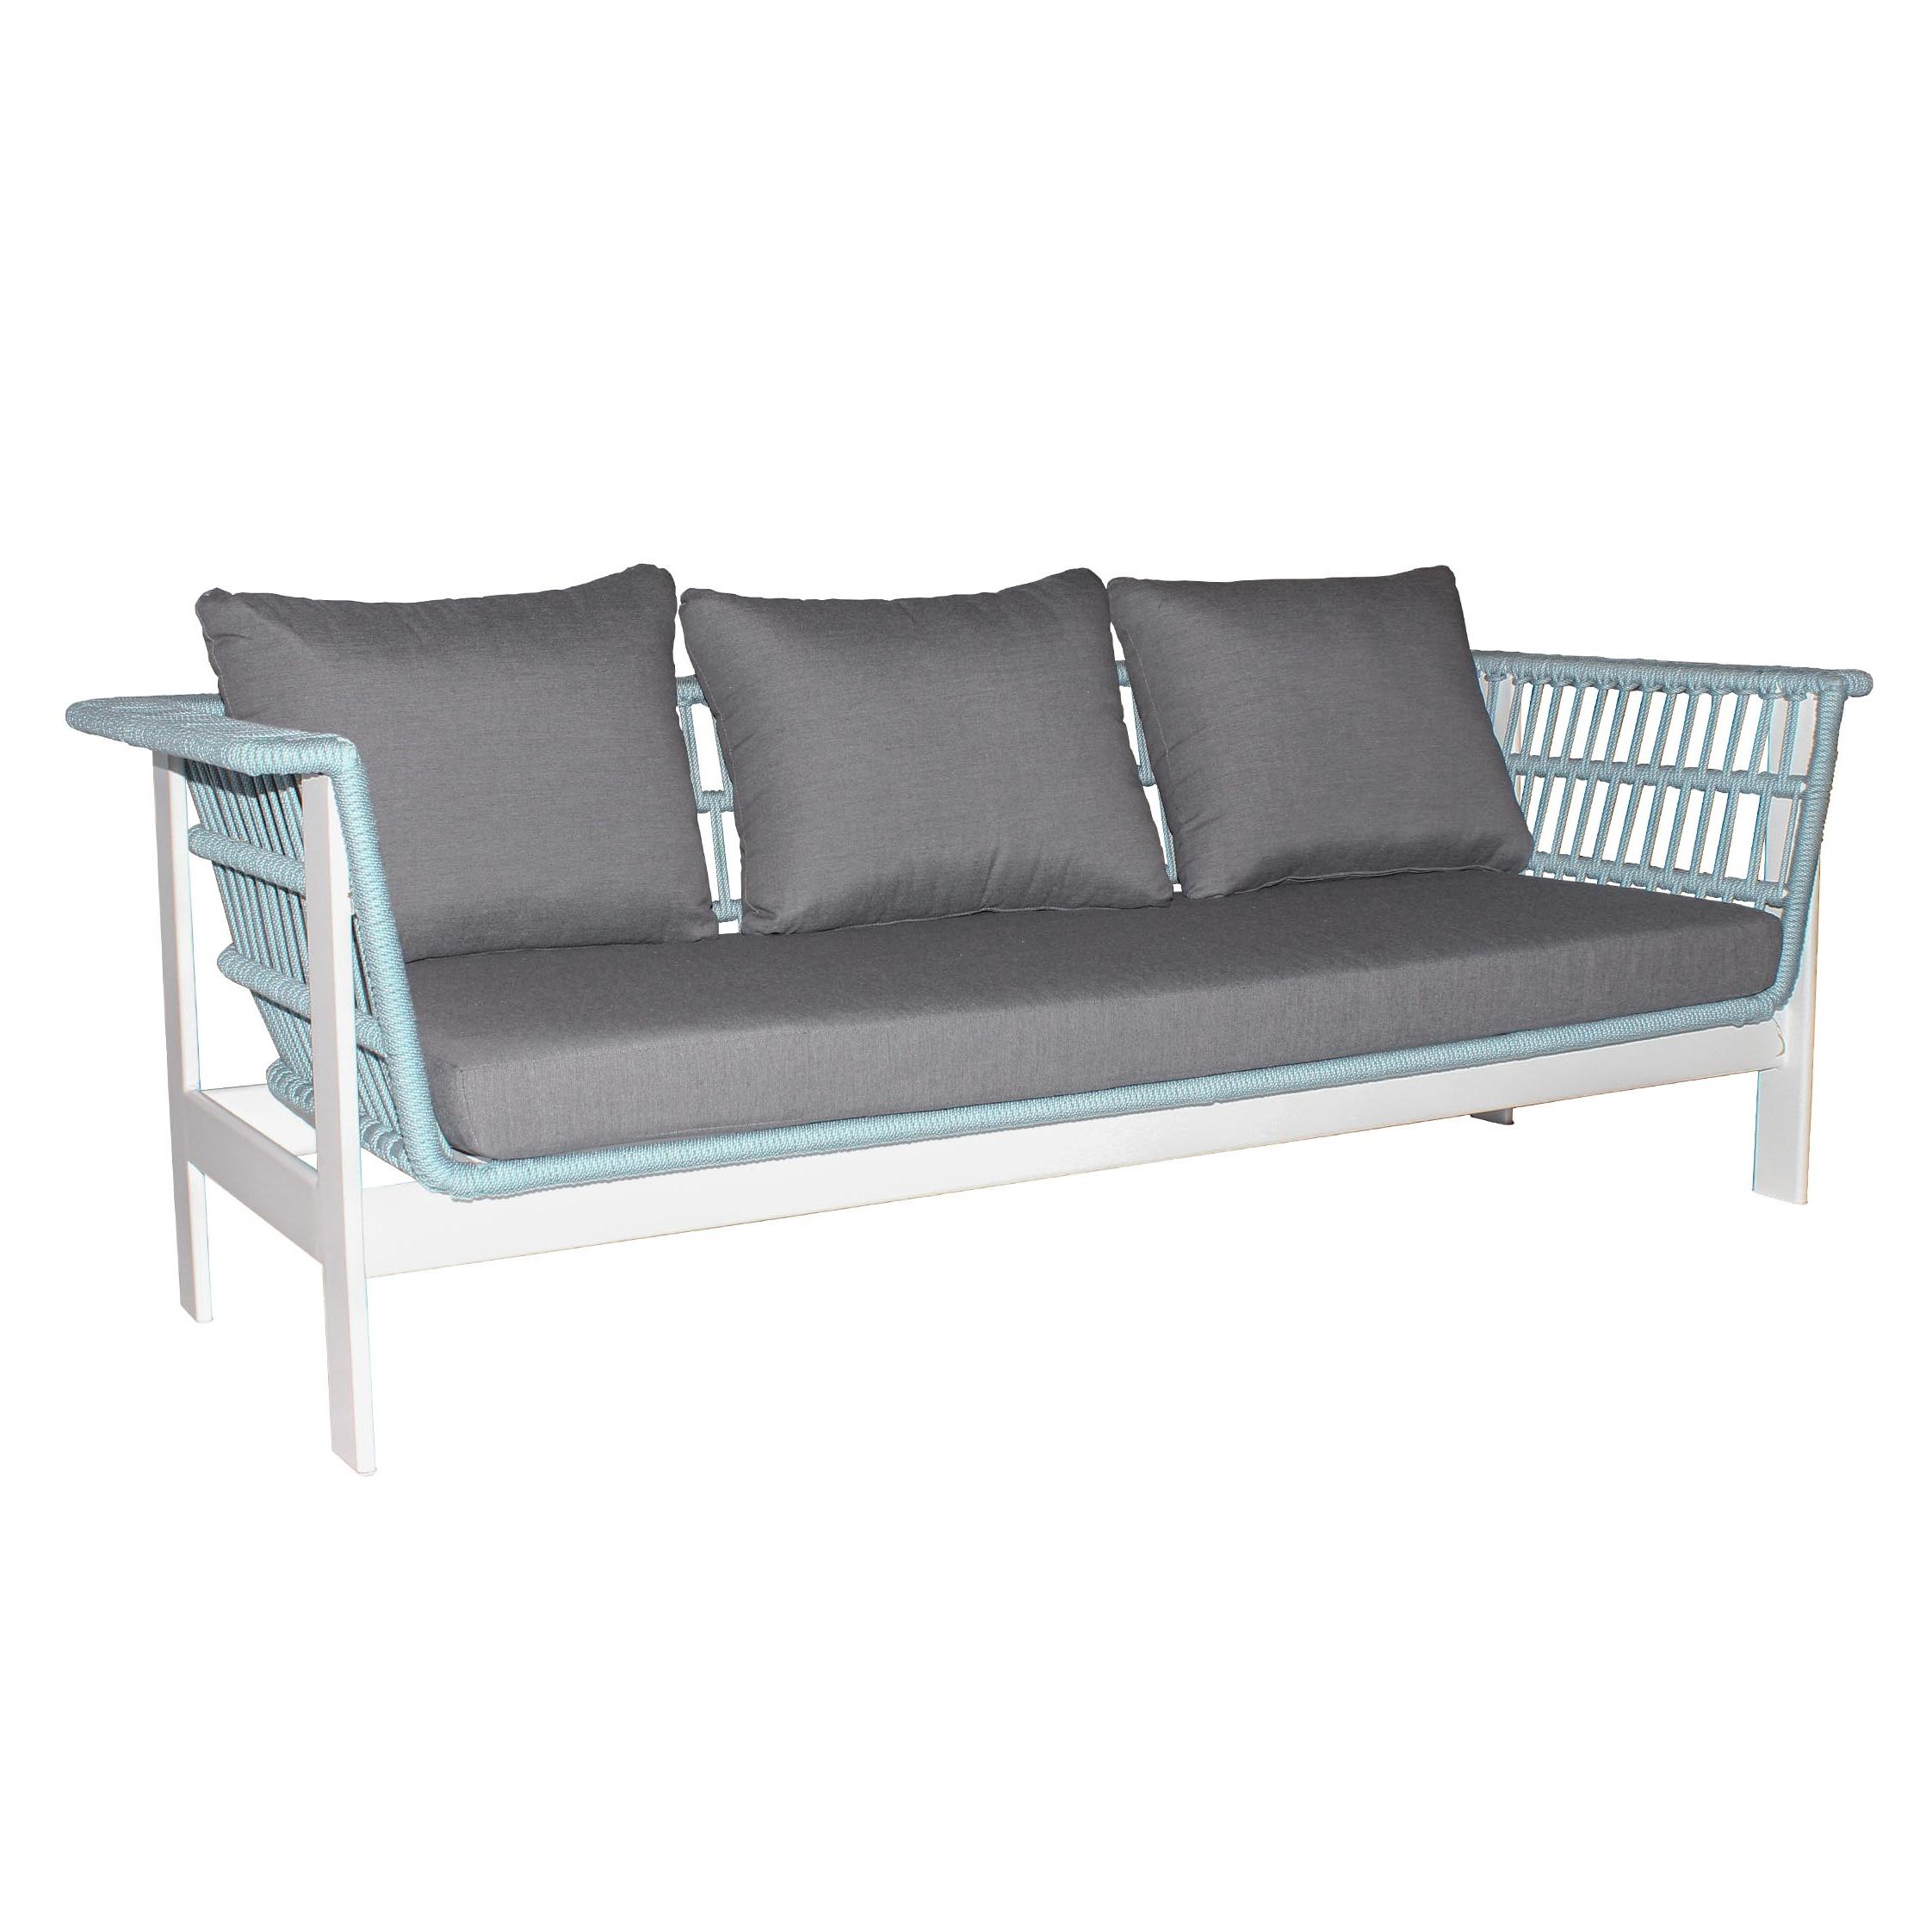 Sofas Murcia Mndw Murcia sofa 3 Seater Patio Warehouse